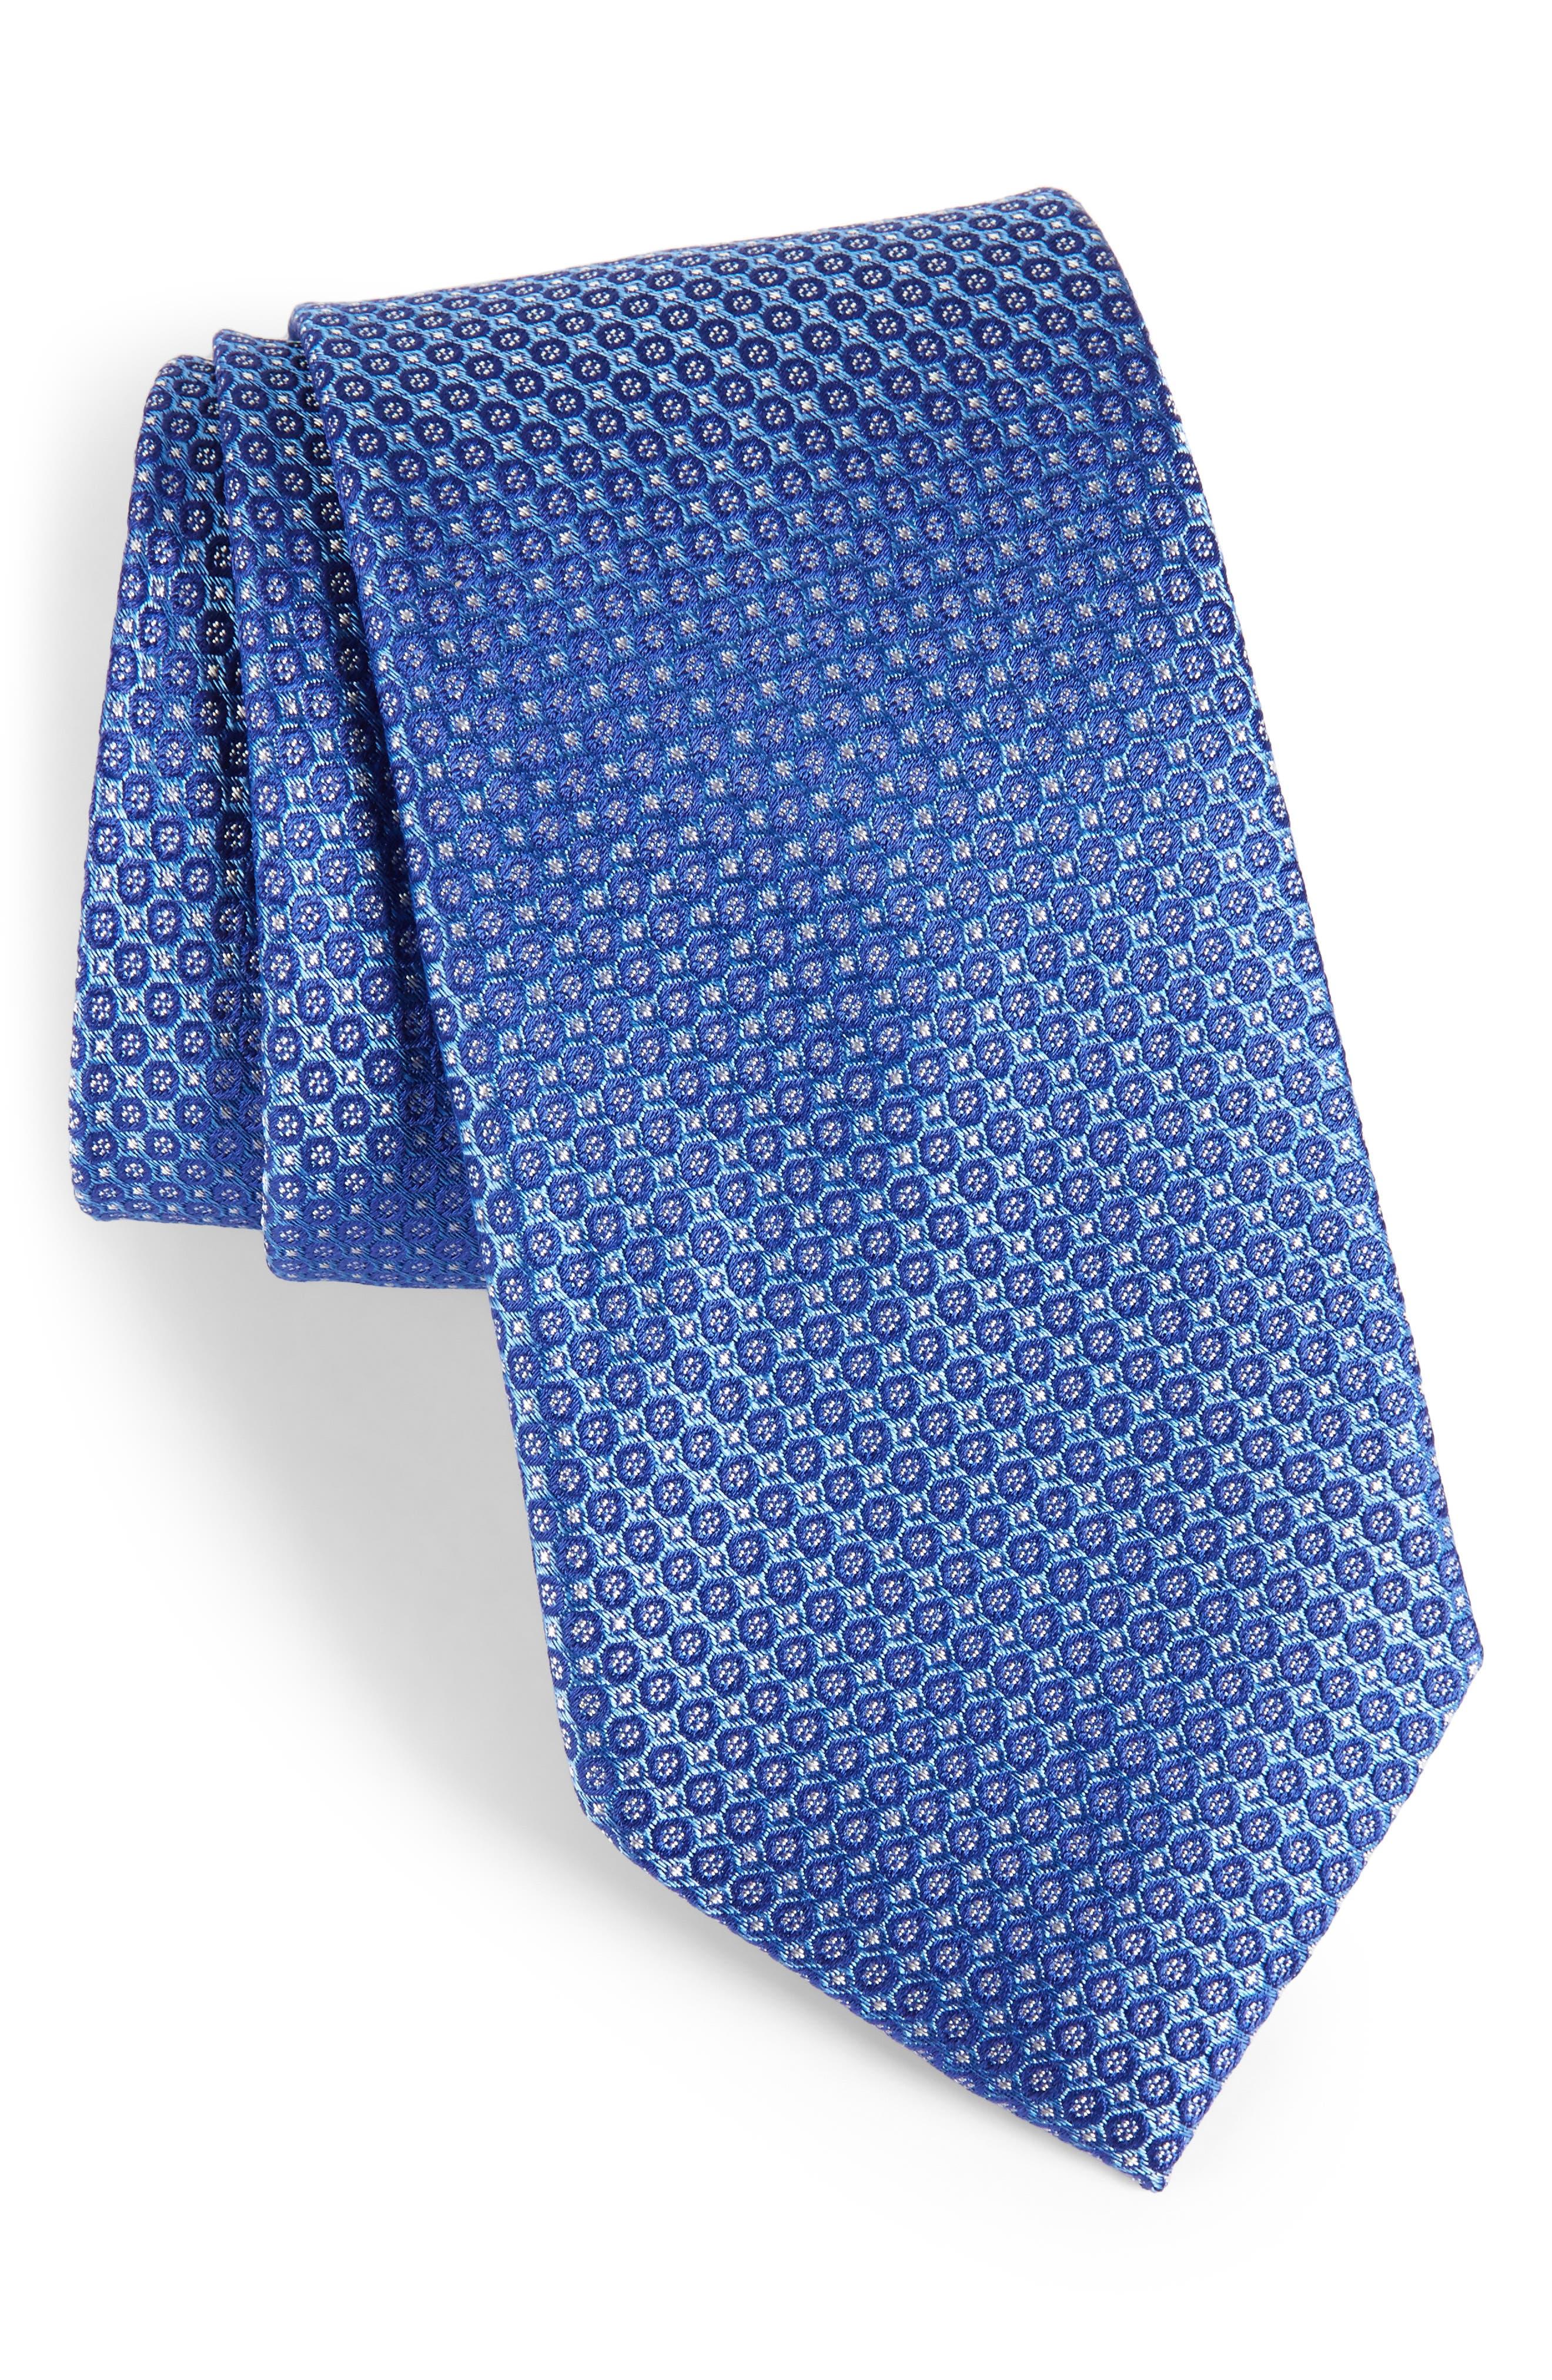 Park Ave Solid Silk Tie,                             Main thumbnail 1, color,                             400